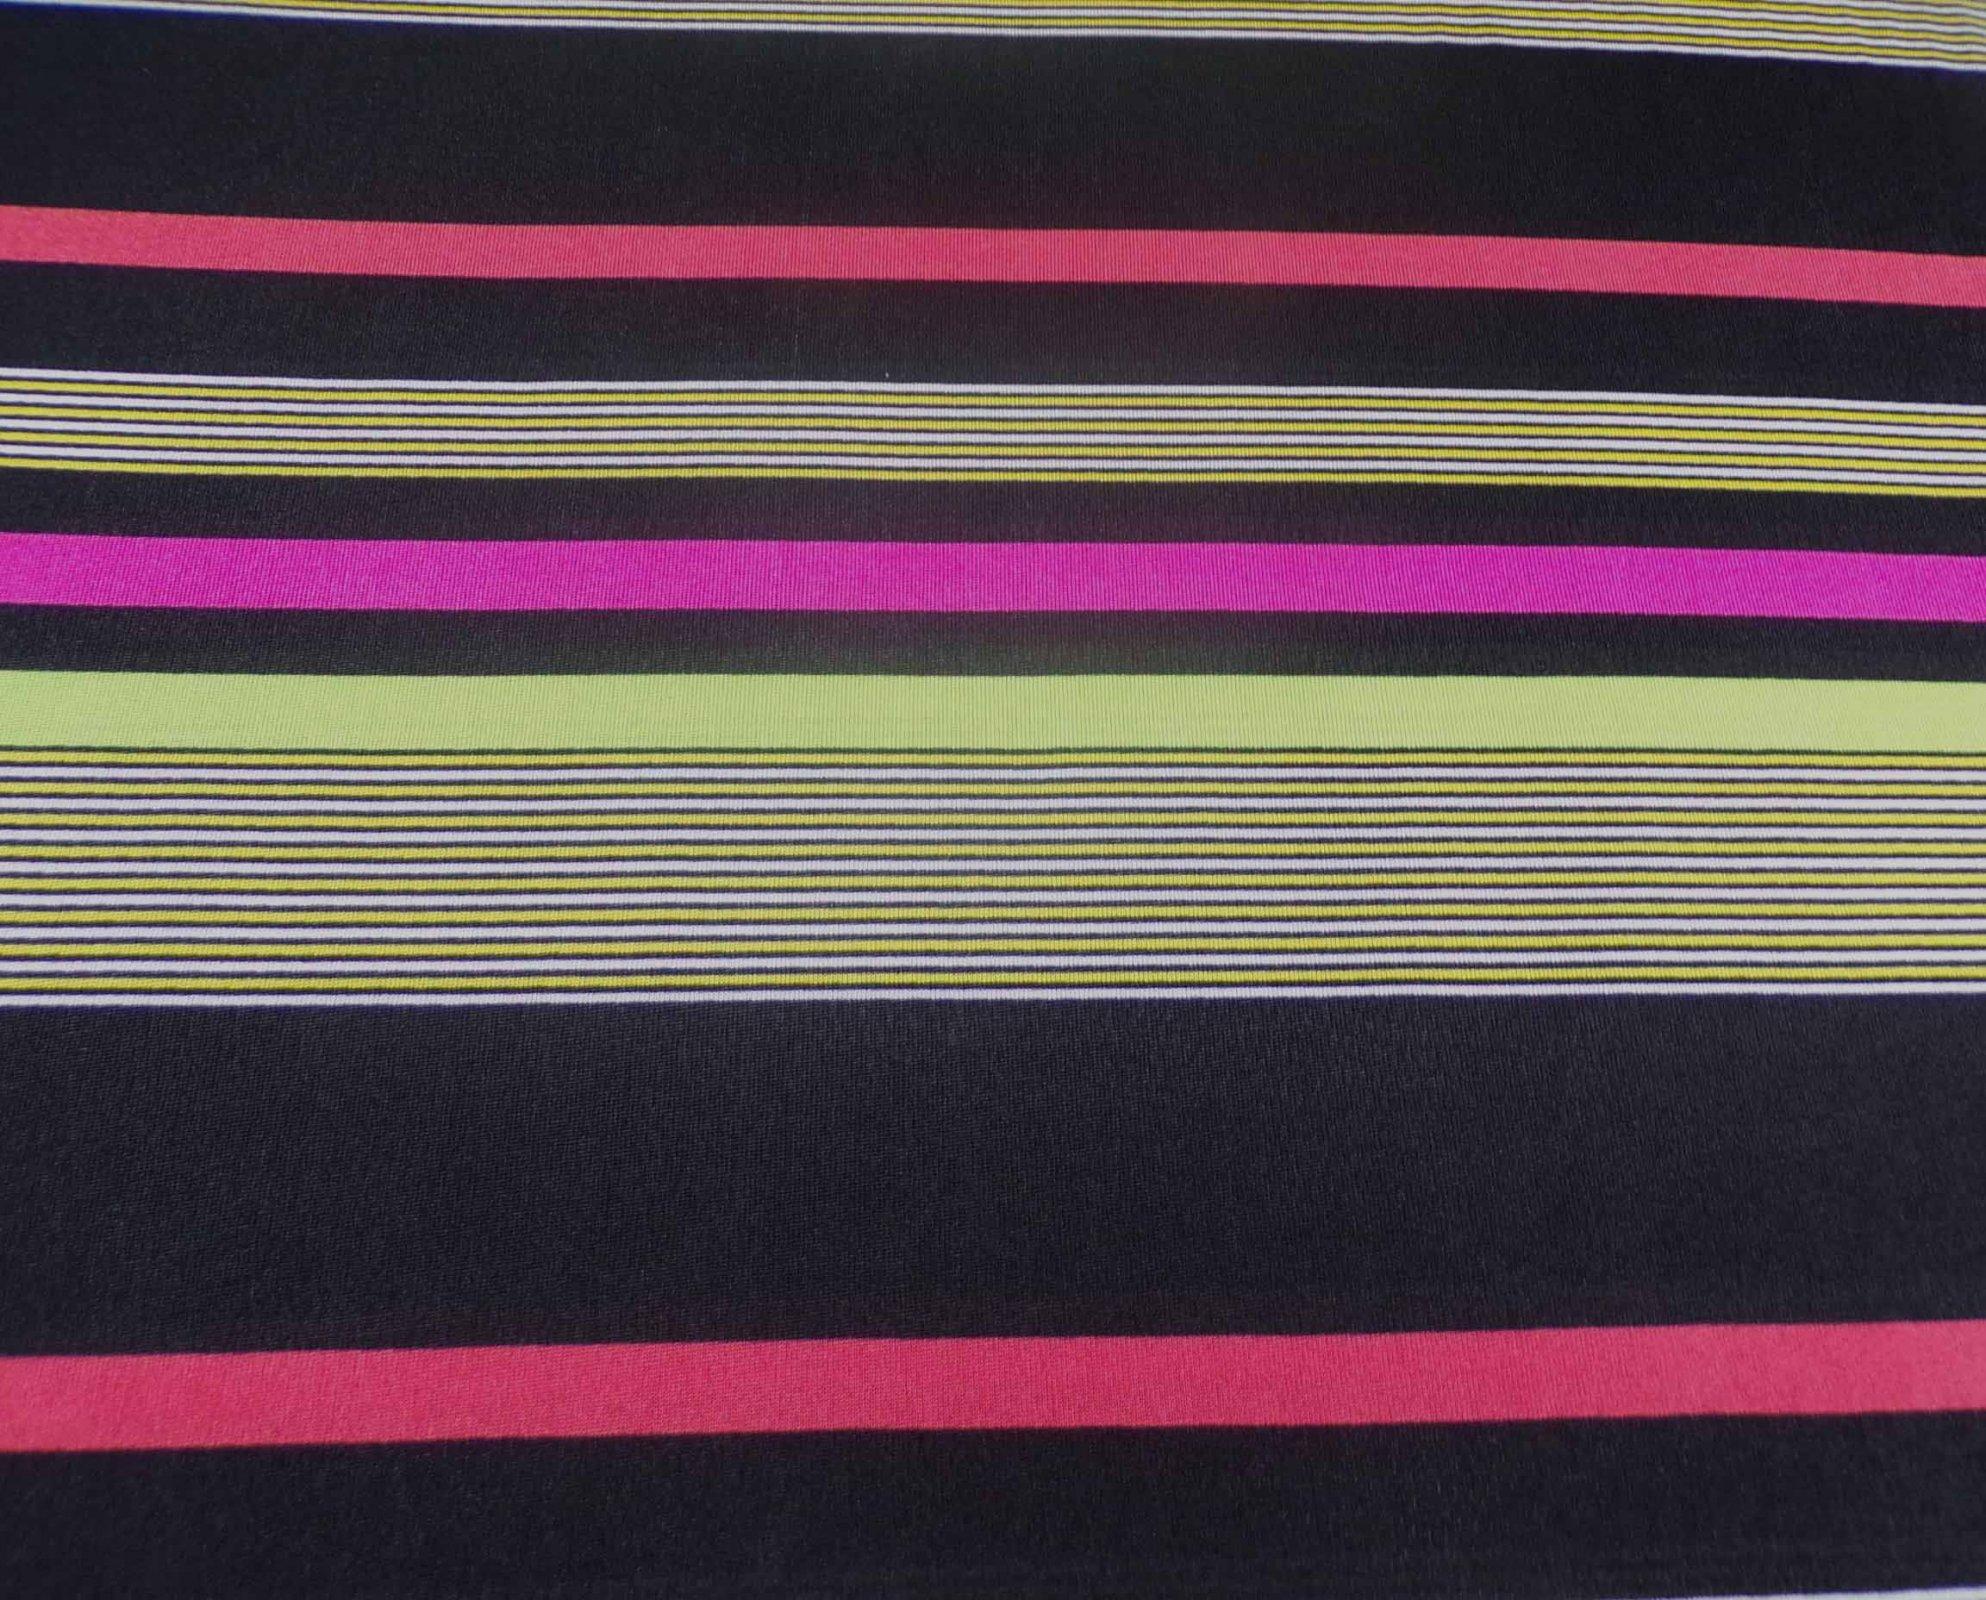 Black & Neon Striped Sweater Knit